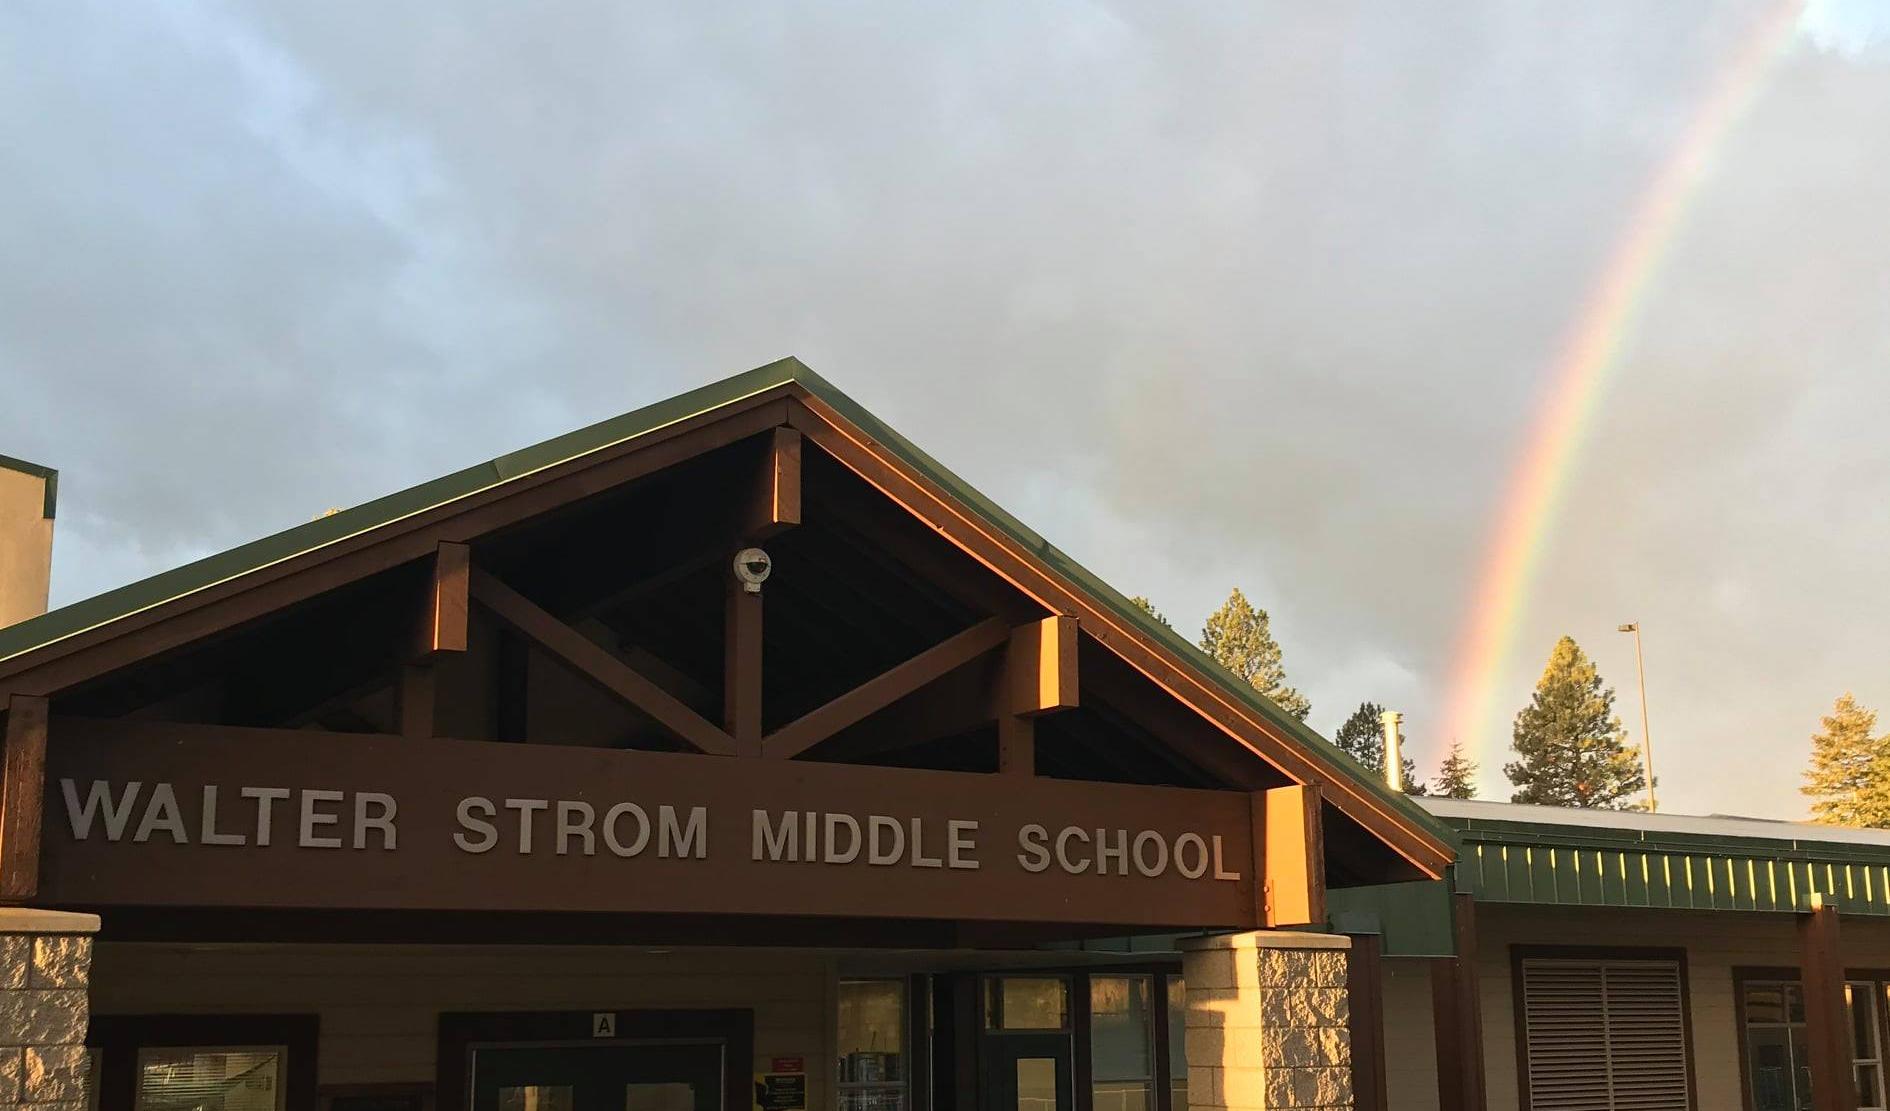 Rainbow above WSMS